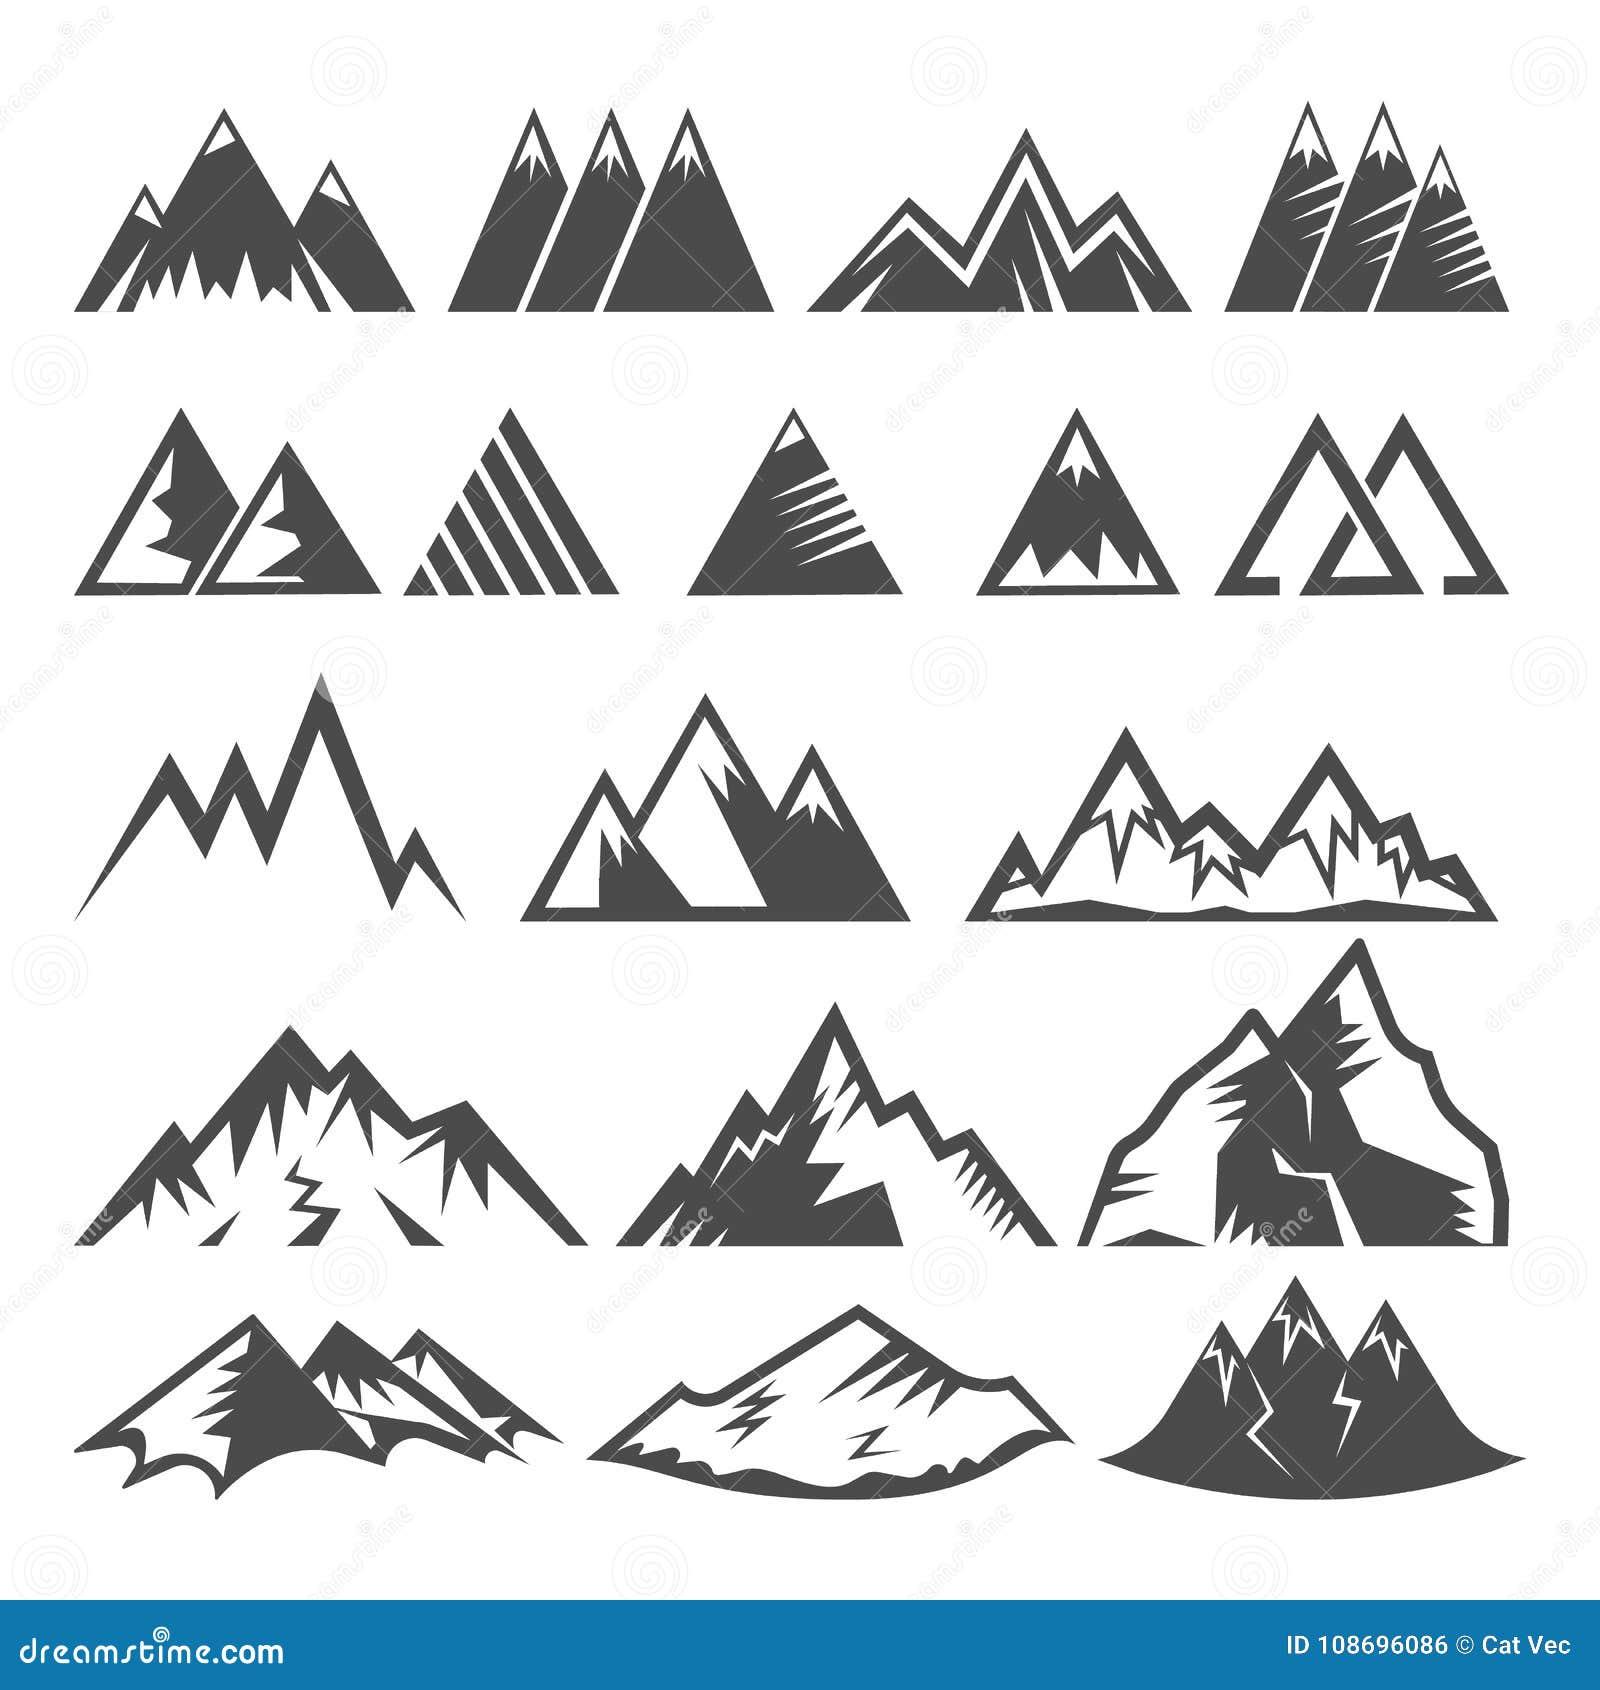 Mountain logo vector mounting logotype peak of mount and winter mountainous valleys hiking mountaineering rock climbing